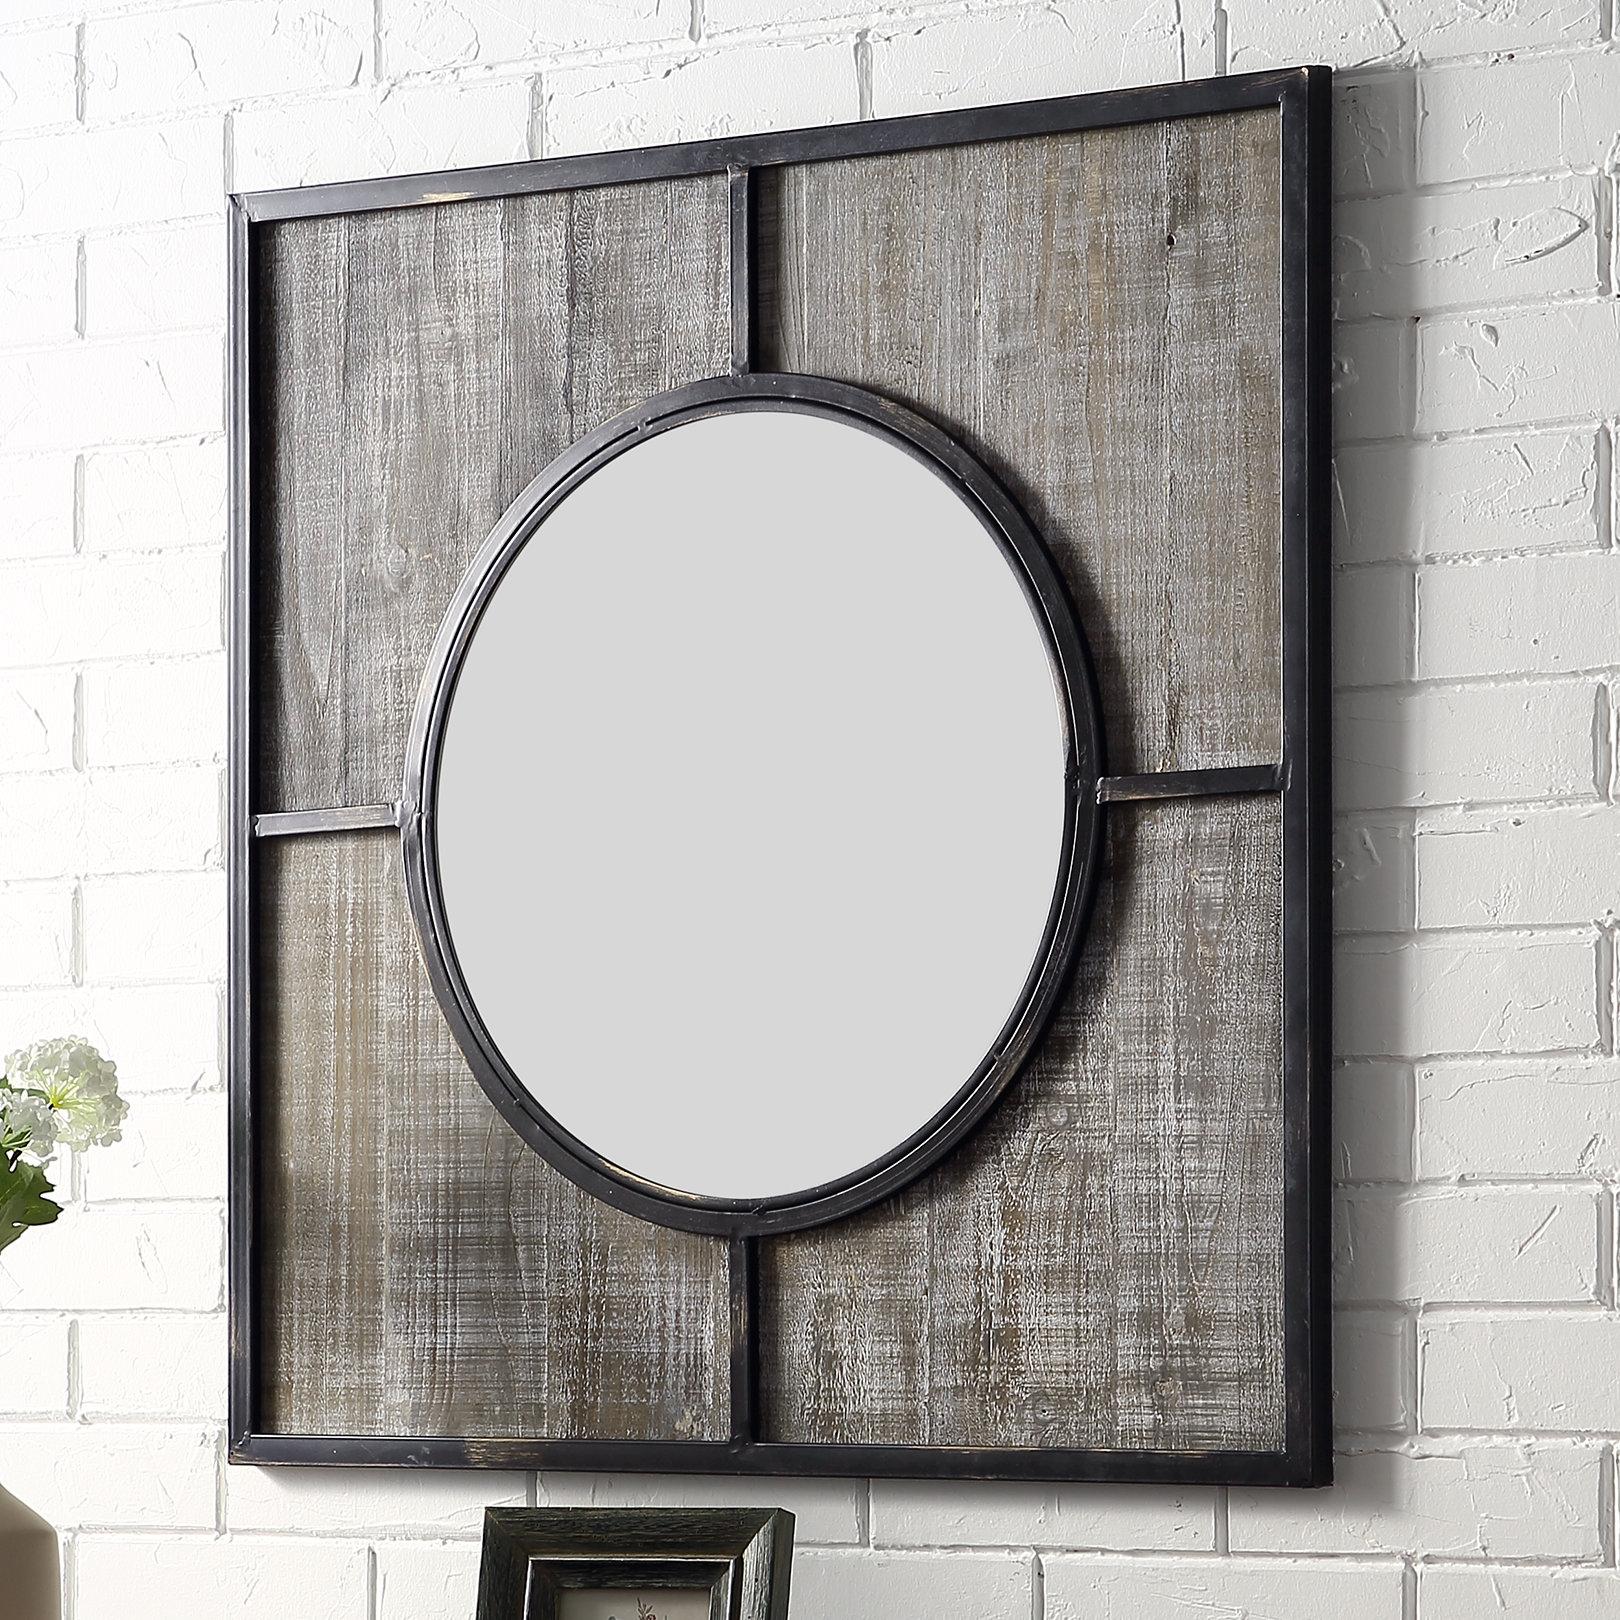 Farmhouse Woodgrain Mirror | Wayfair Pertaining To Farmhouse Woodgrain And Leaf Accent Wall Mirrors (View 11 of 20)